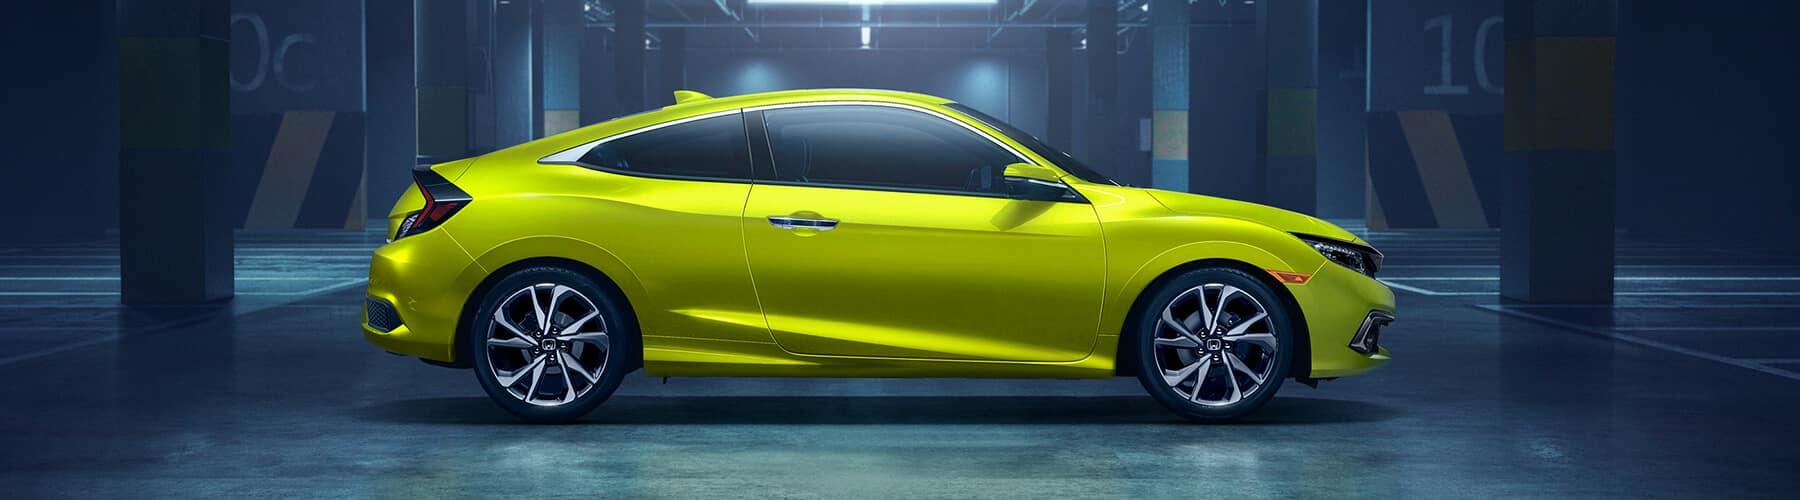 2019 Honda Civic Coupe Slider